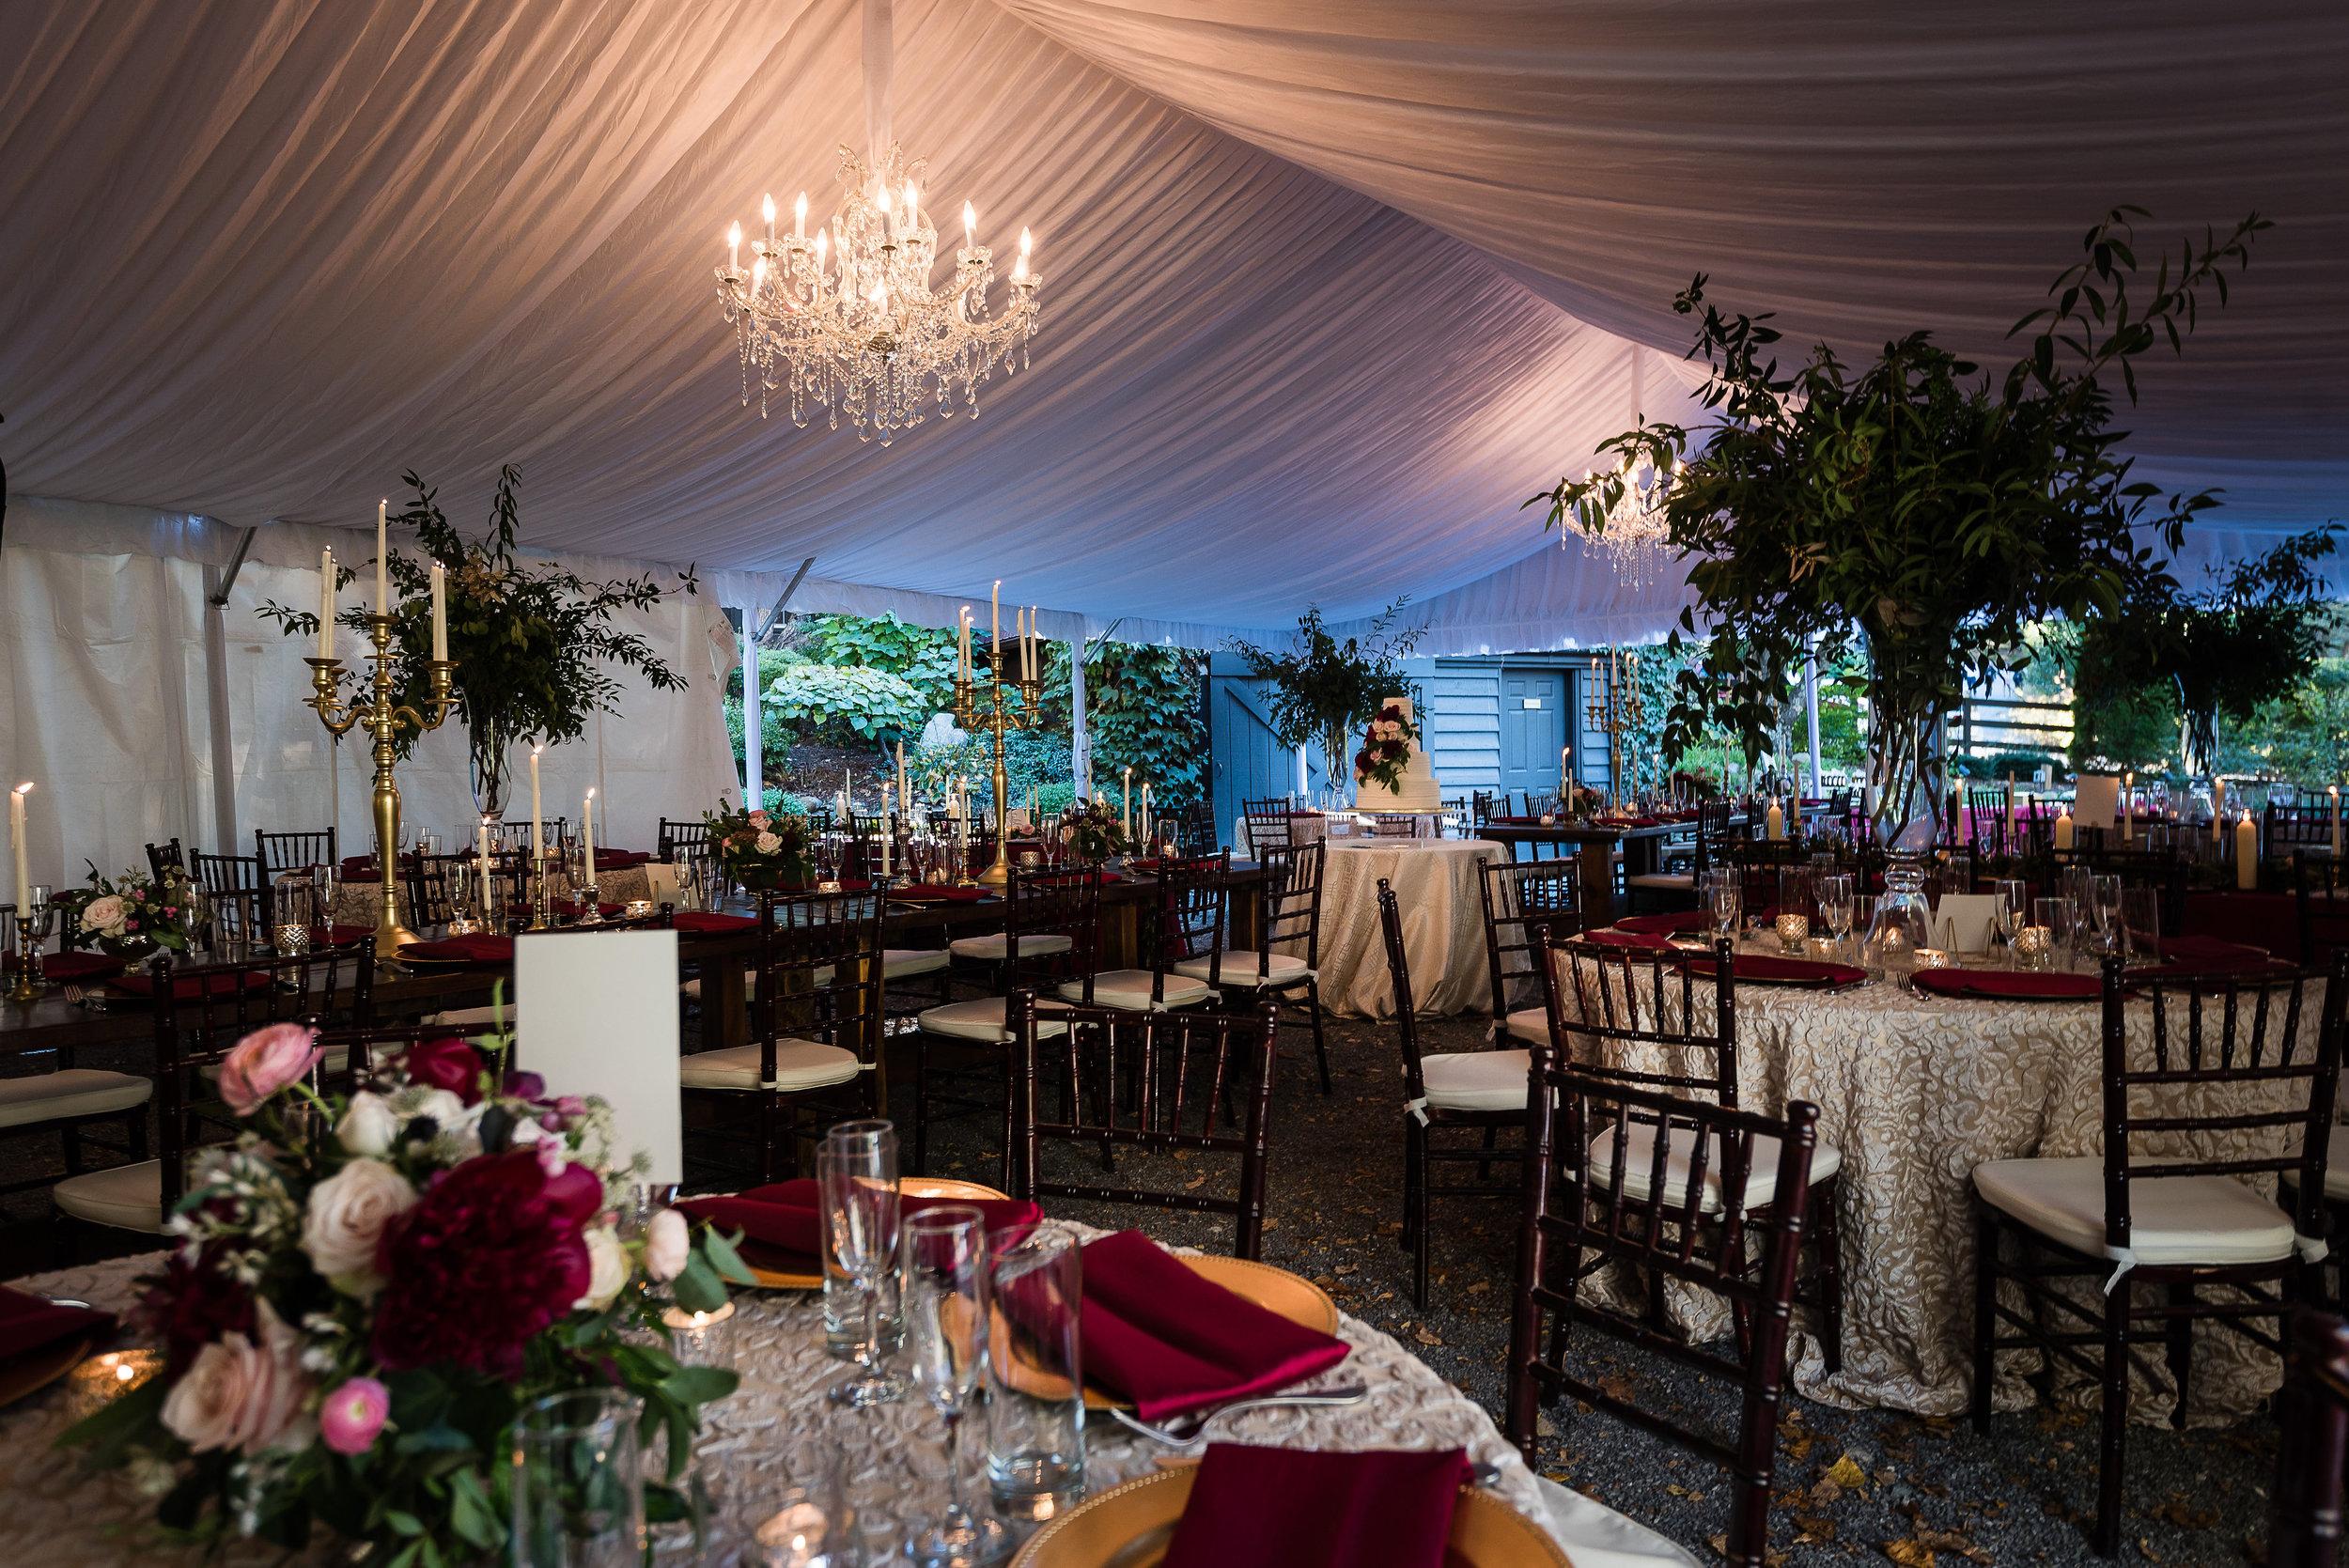 Hawkesdene wedding, Marsala wedding inspiration, Asheville wedding venue, Wedding in the mountains, Greenery inspired wedding, Tall wedding centerpieces, Luxury wedding inspiration